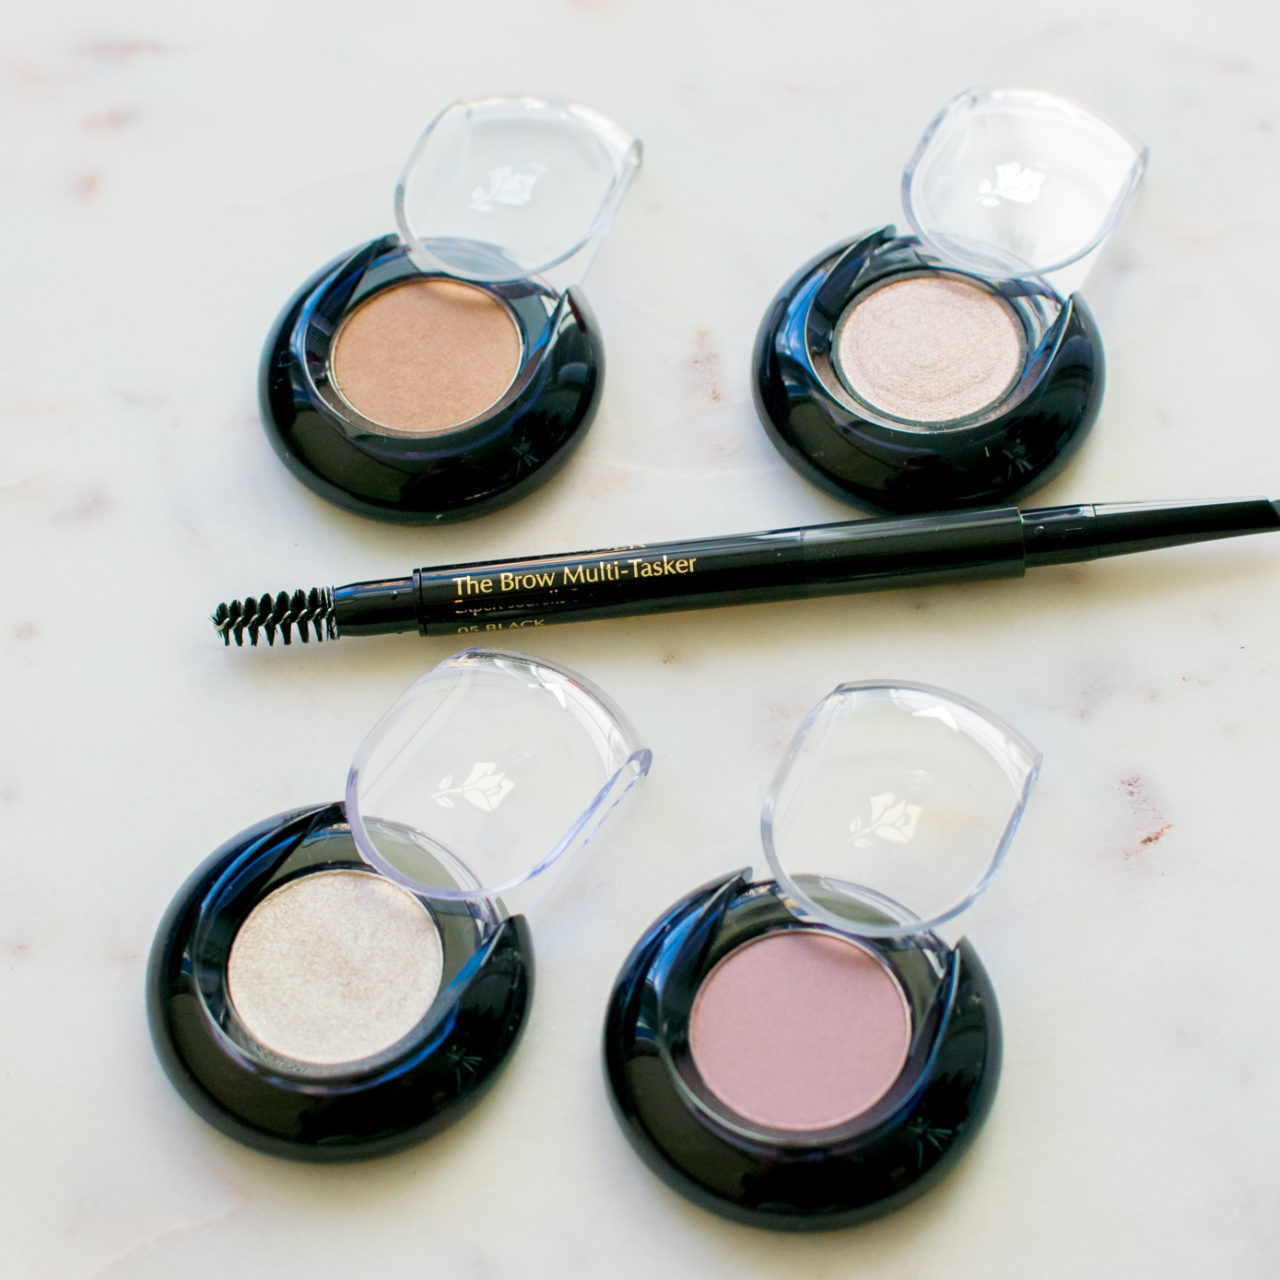 Beauty Finds – Lancôme Color Design Sensational Effects Eyeshadows & Estée Lauder Brow Multi-Tasker